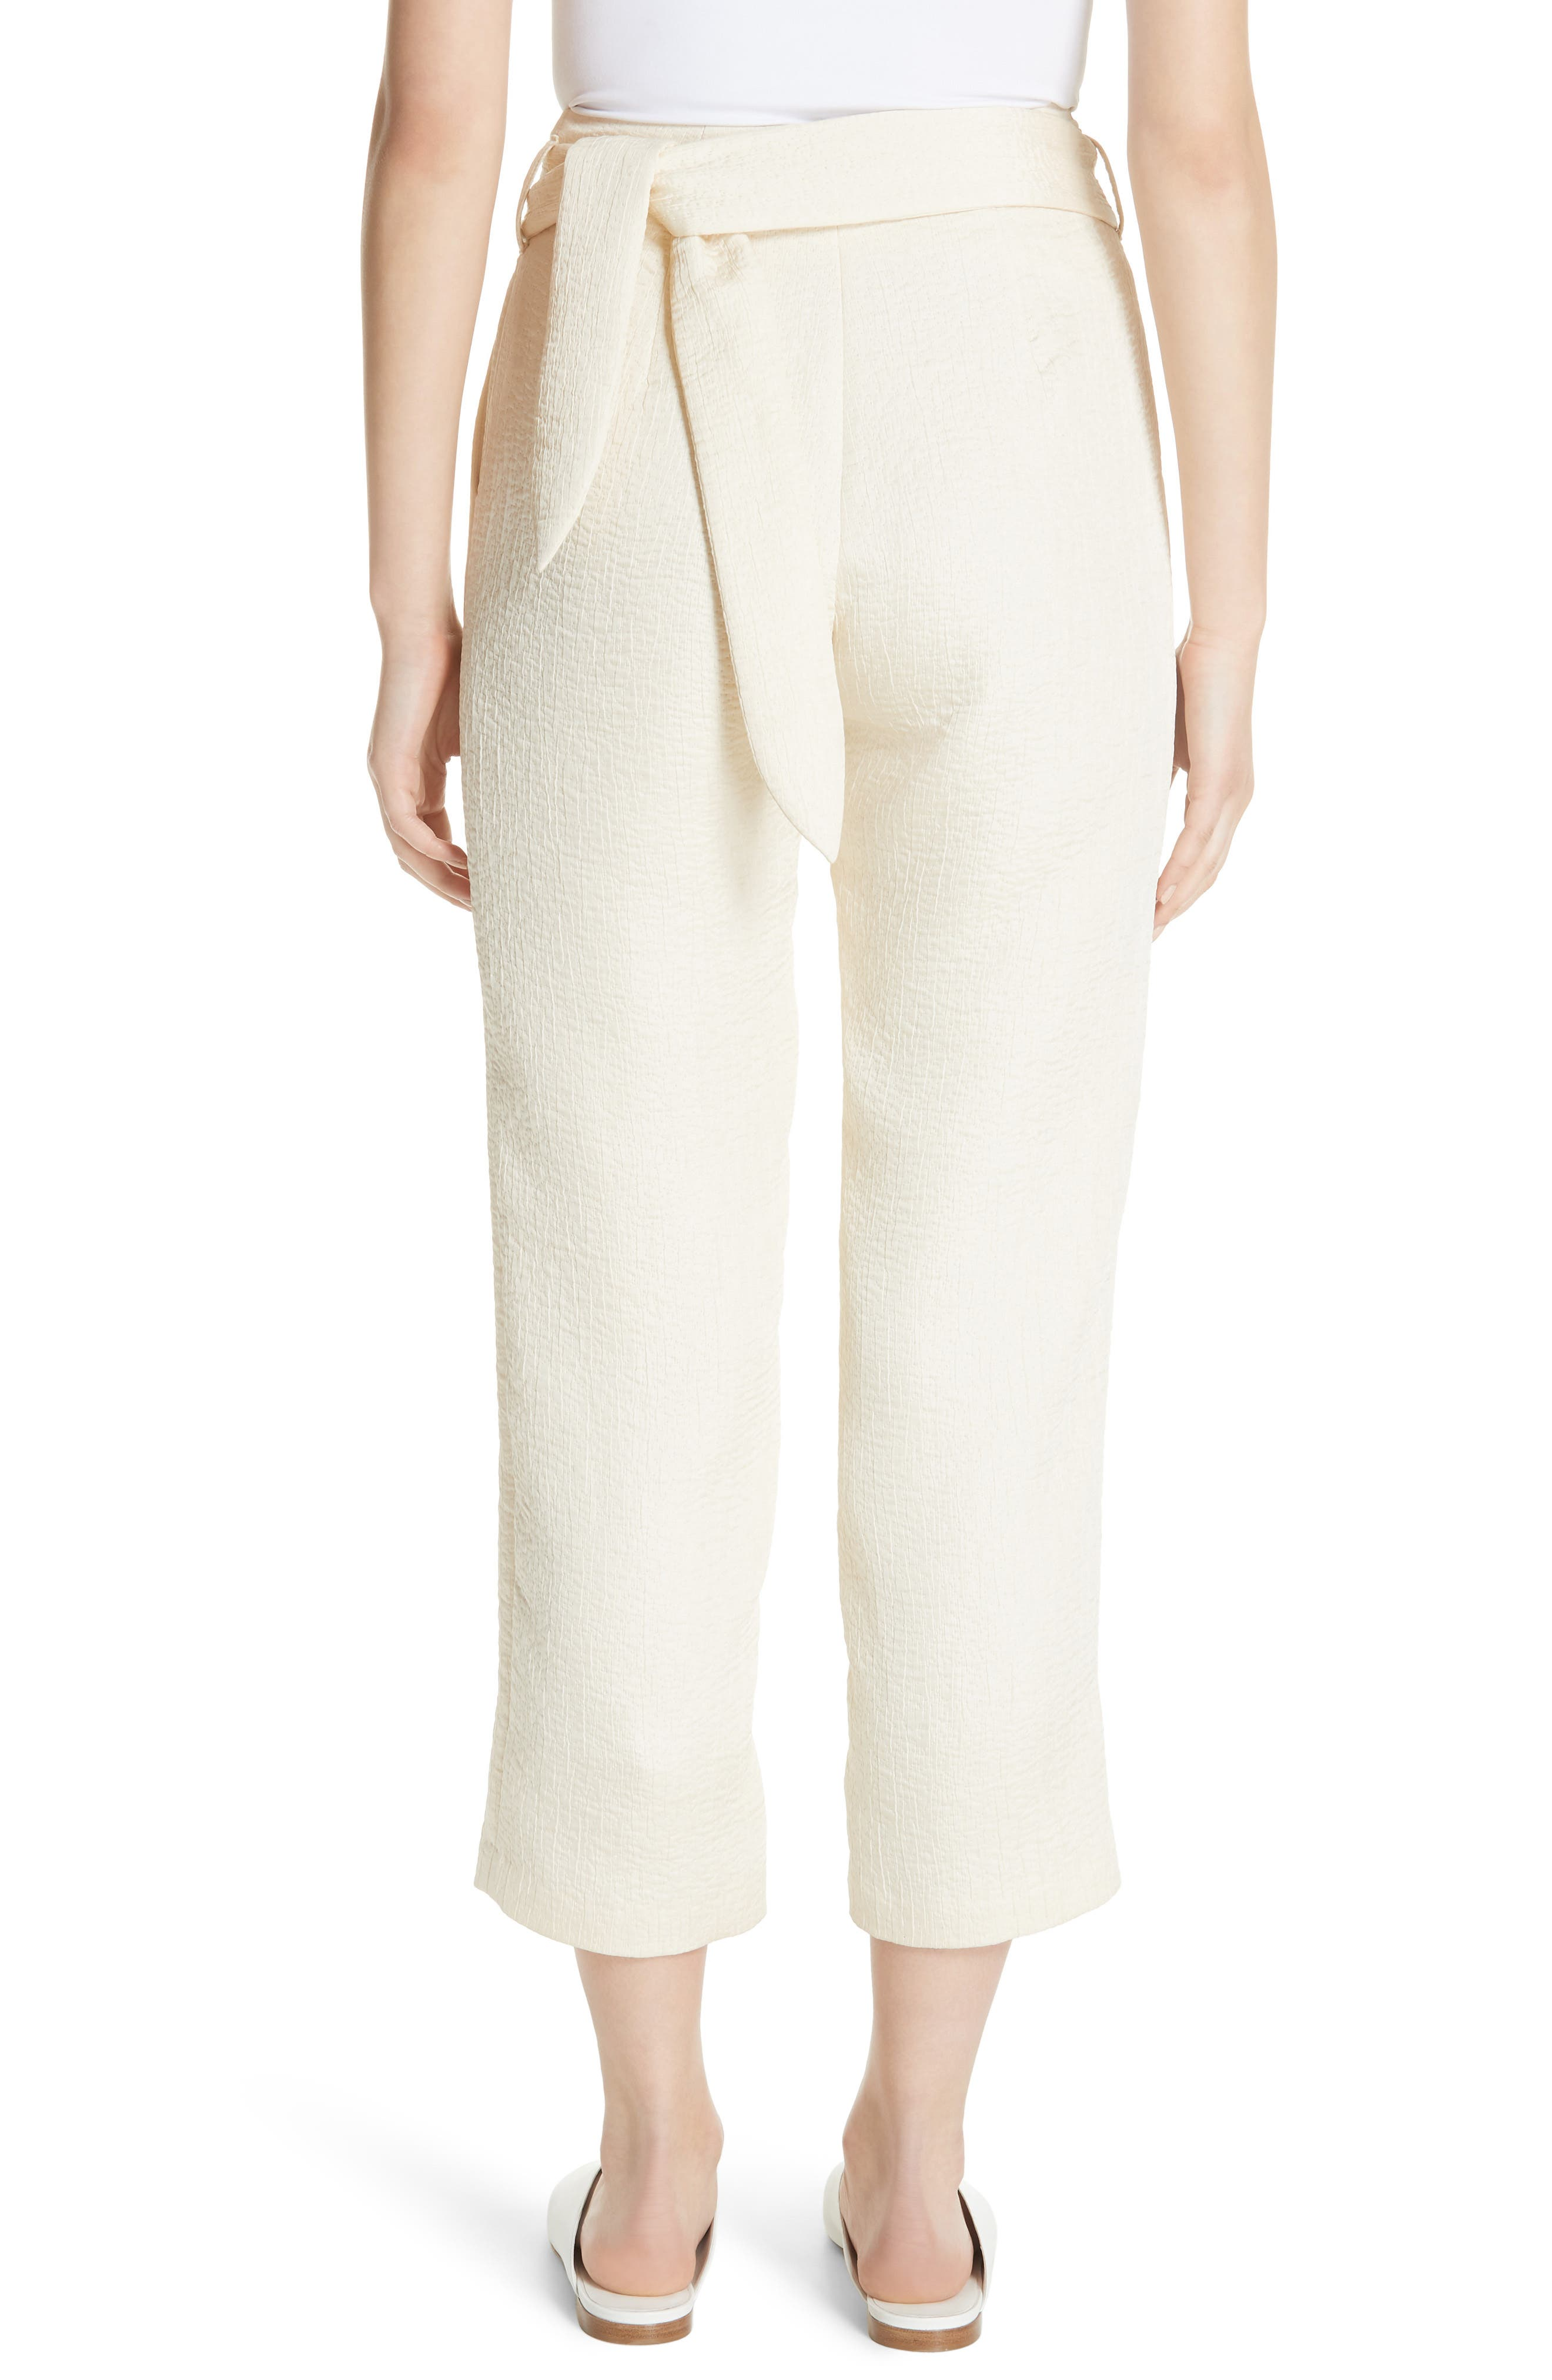 Raimo Belt Bag Crop Pants,                             Alternate thumbnail 2, color,                             900